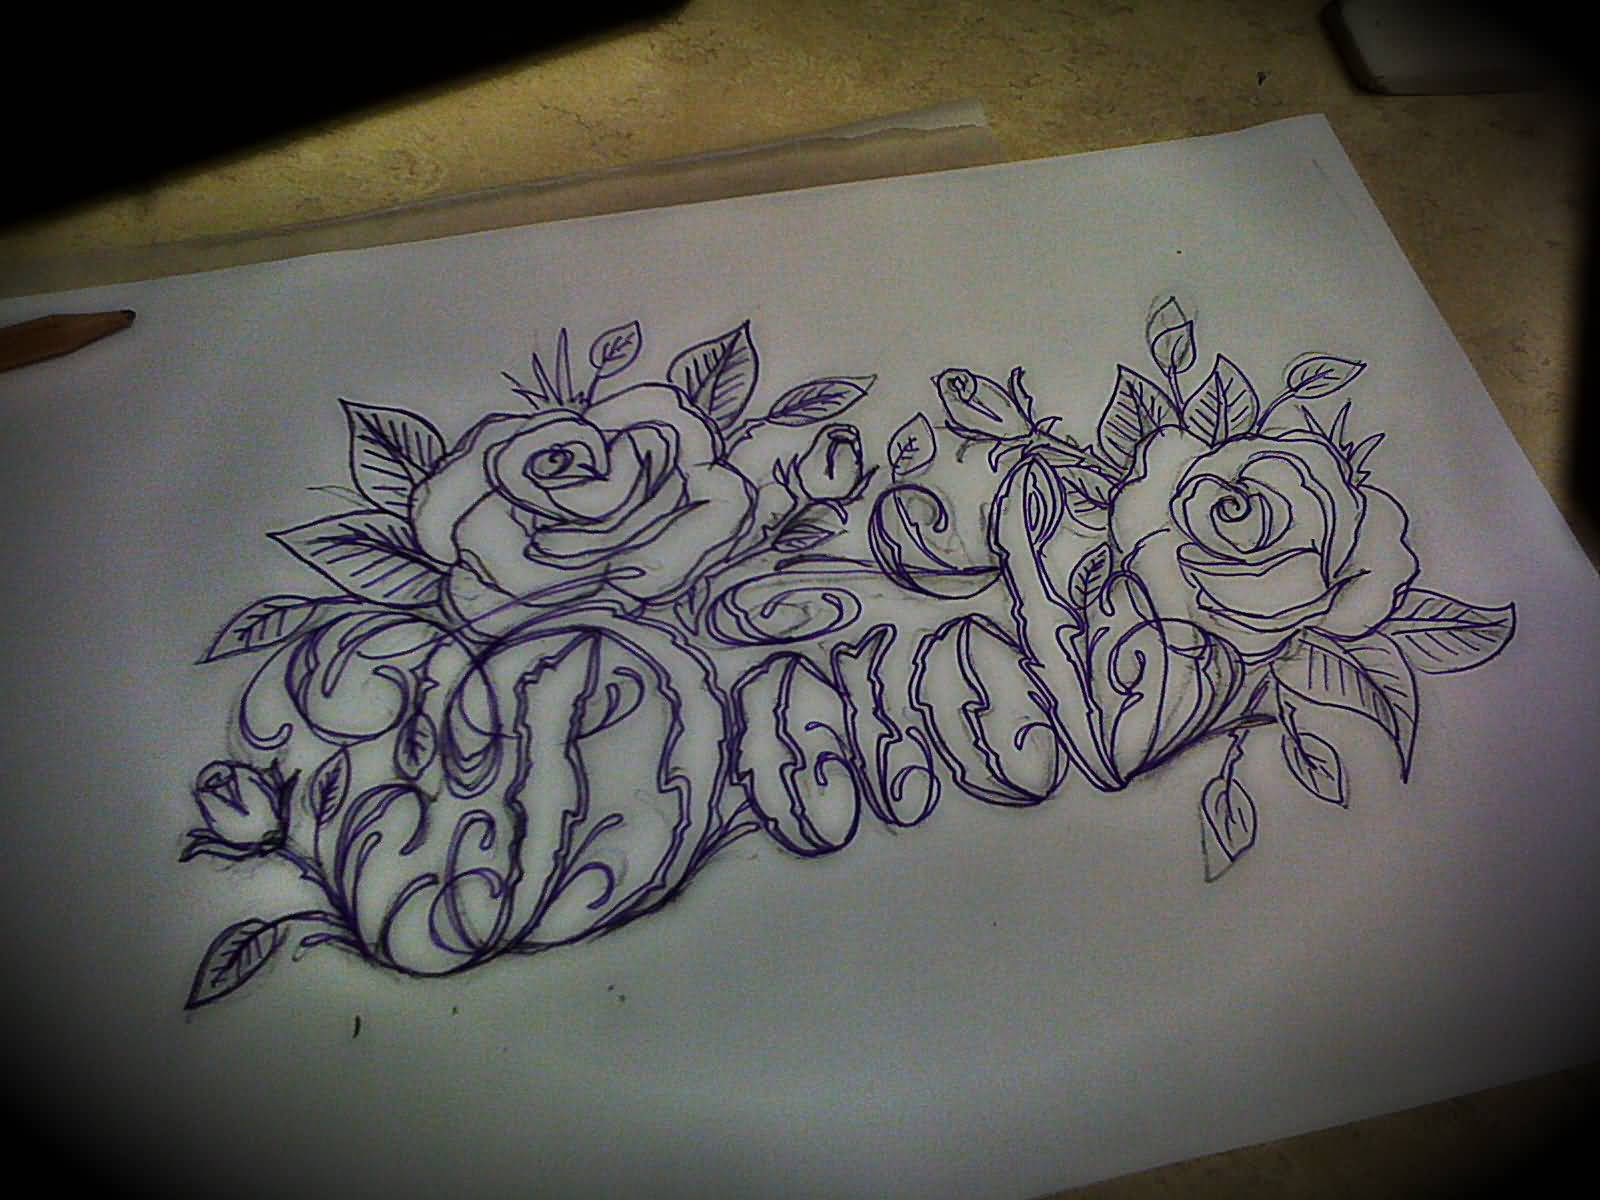 49 wonderful memorial tattoos ideas